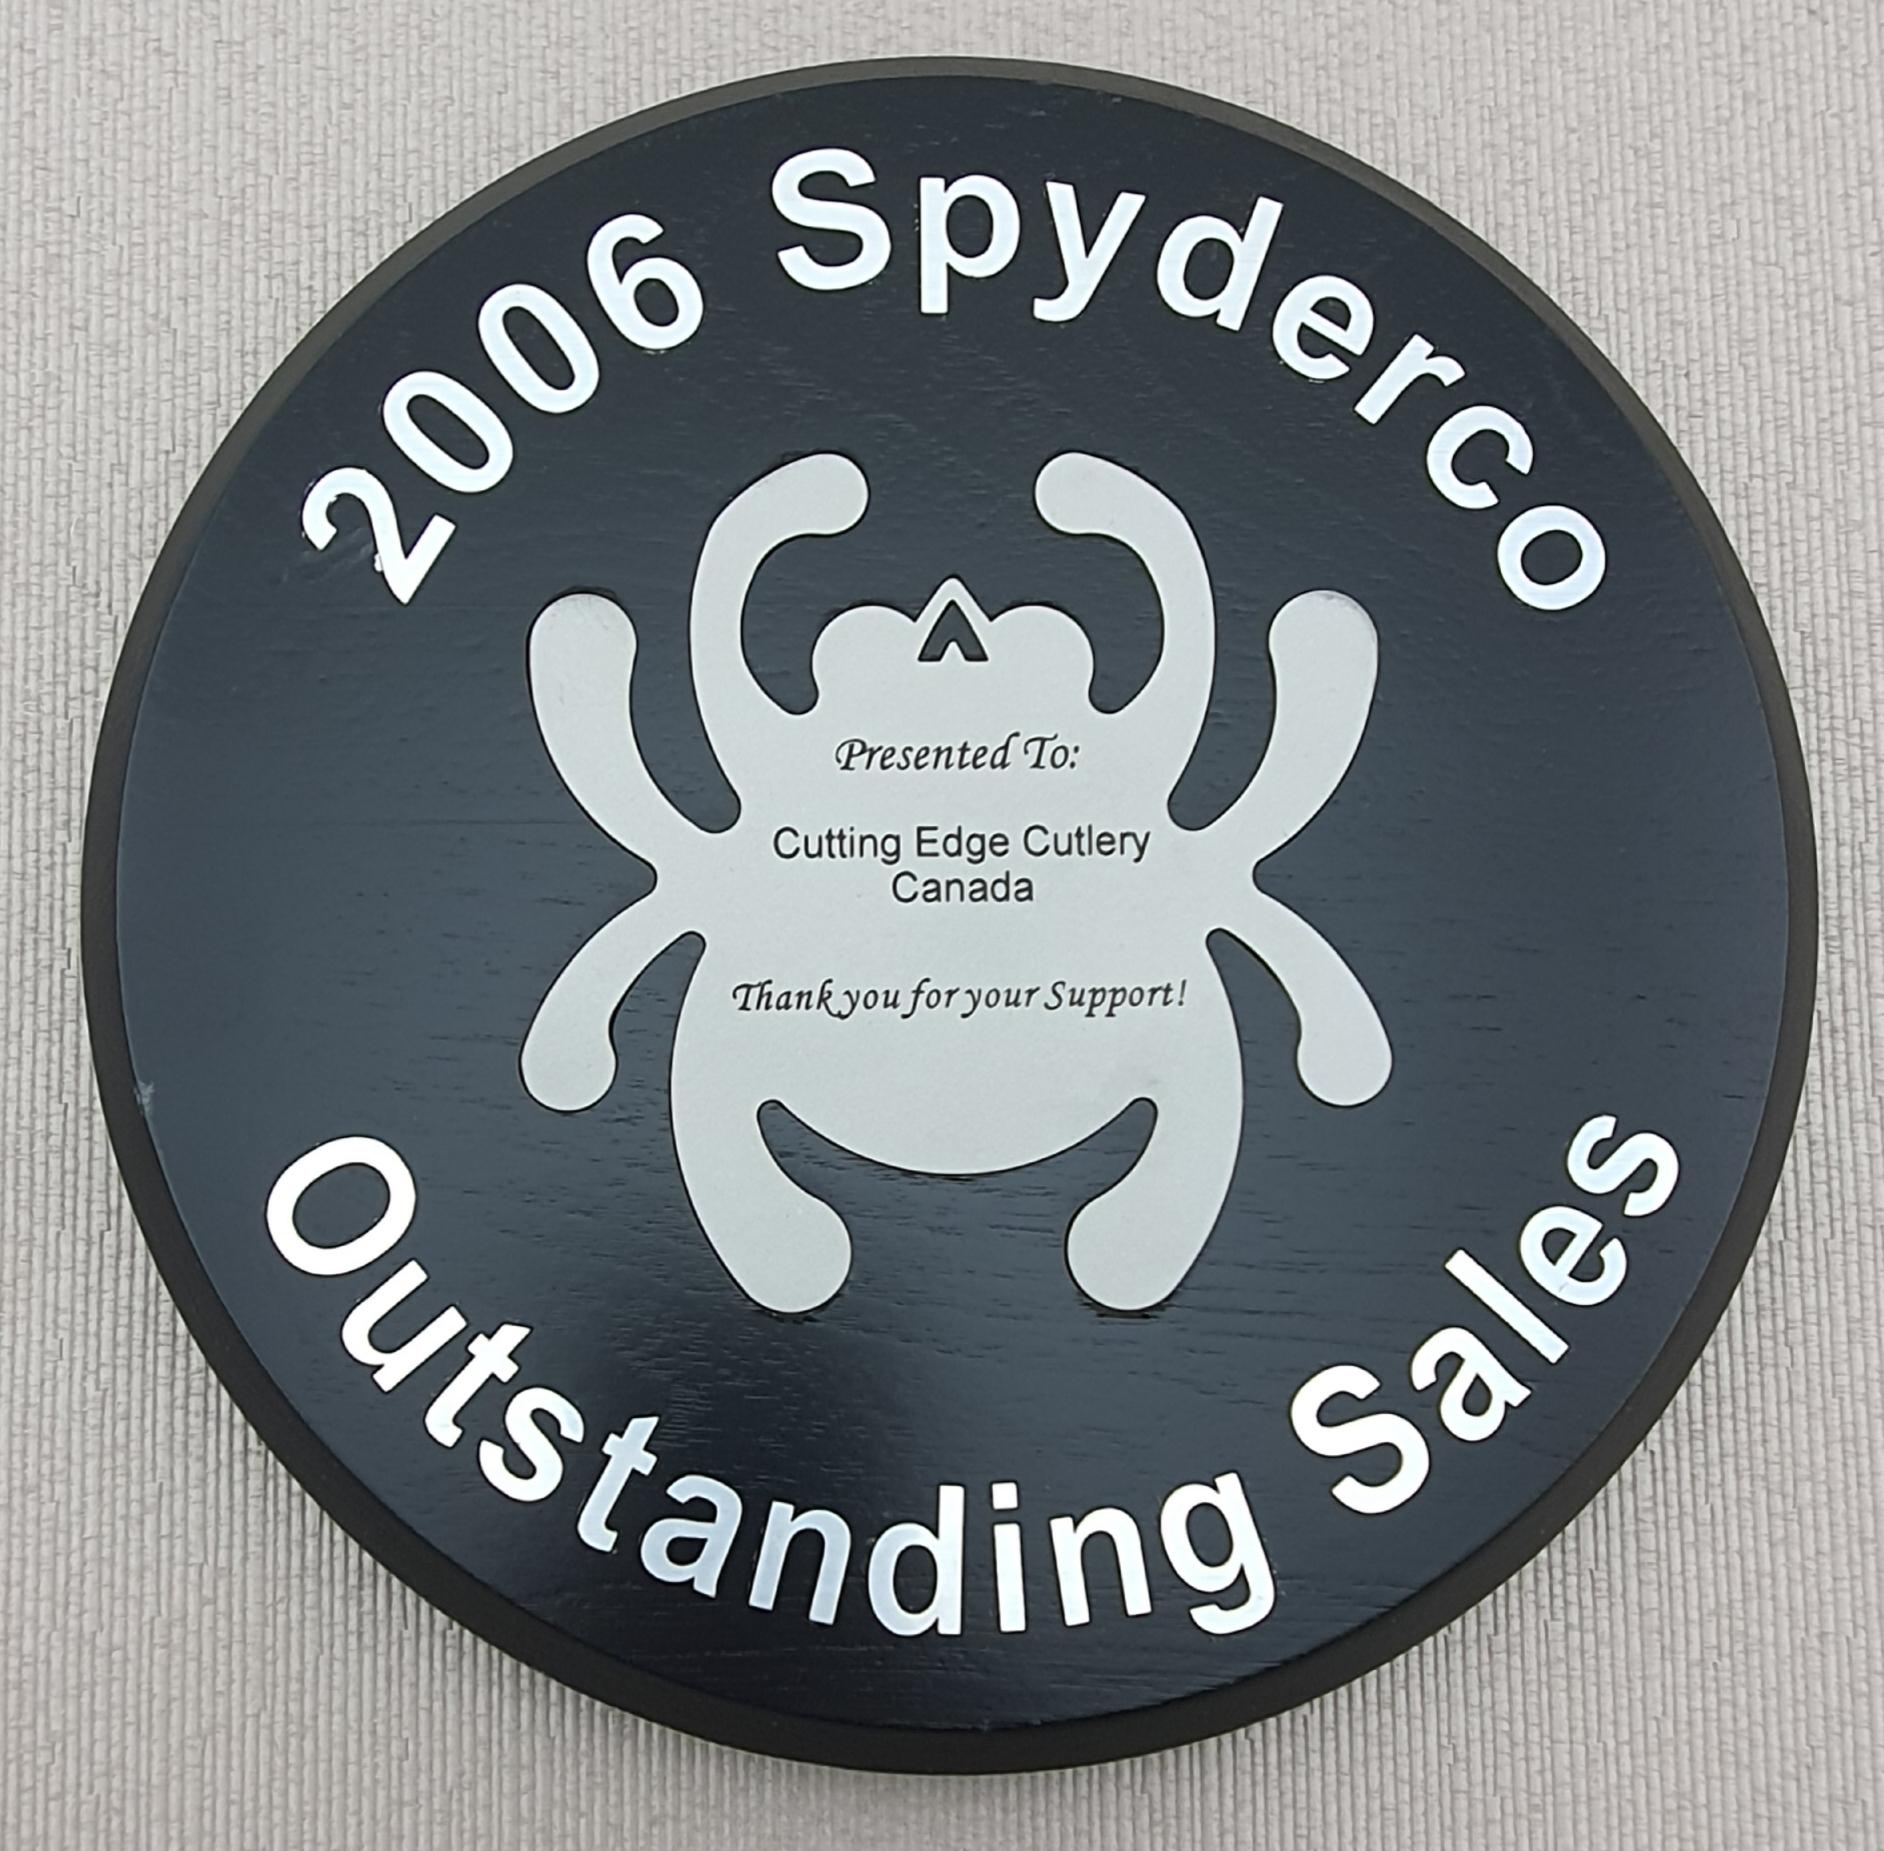 Spyderco award 2006